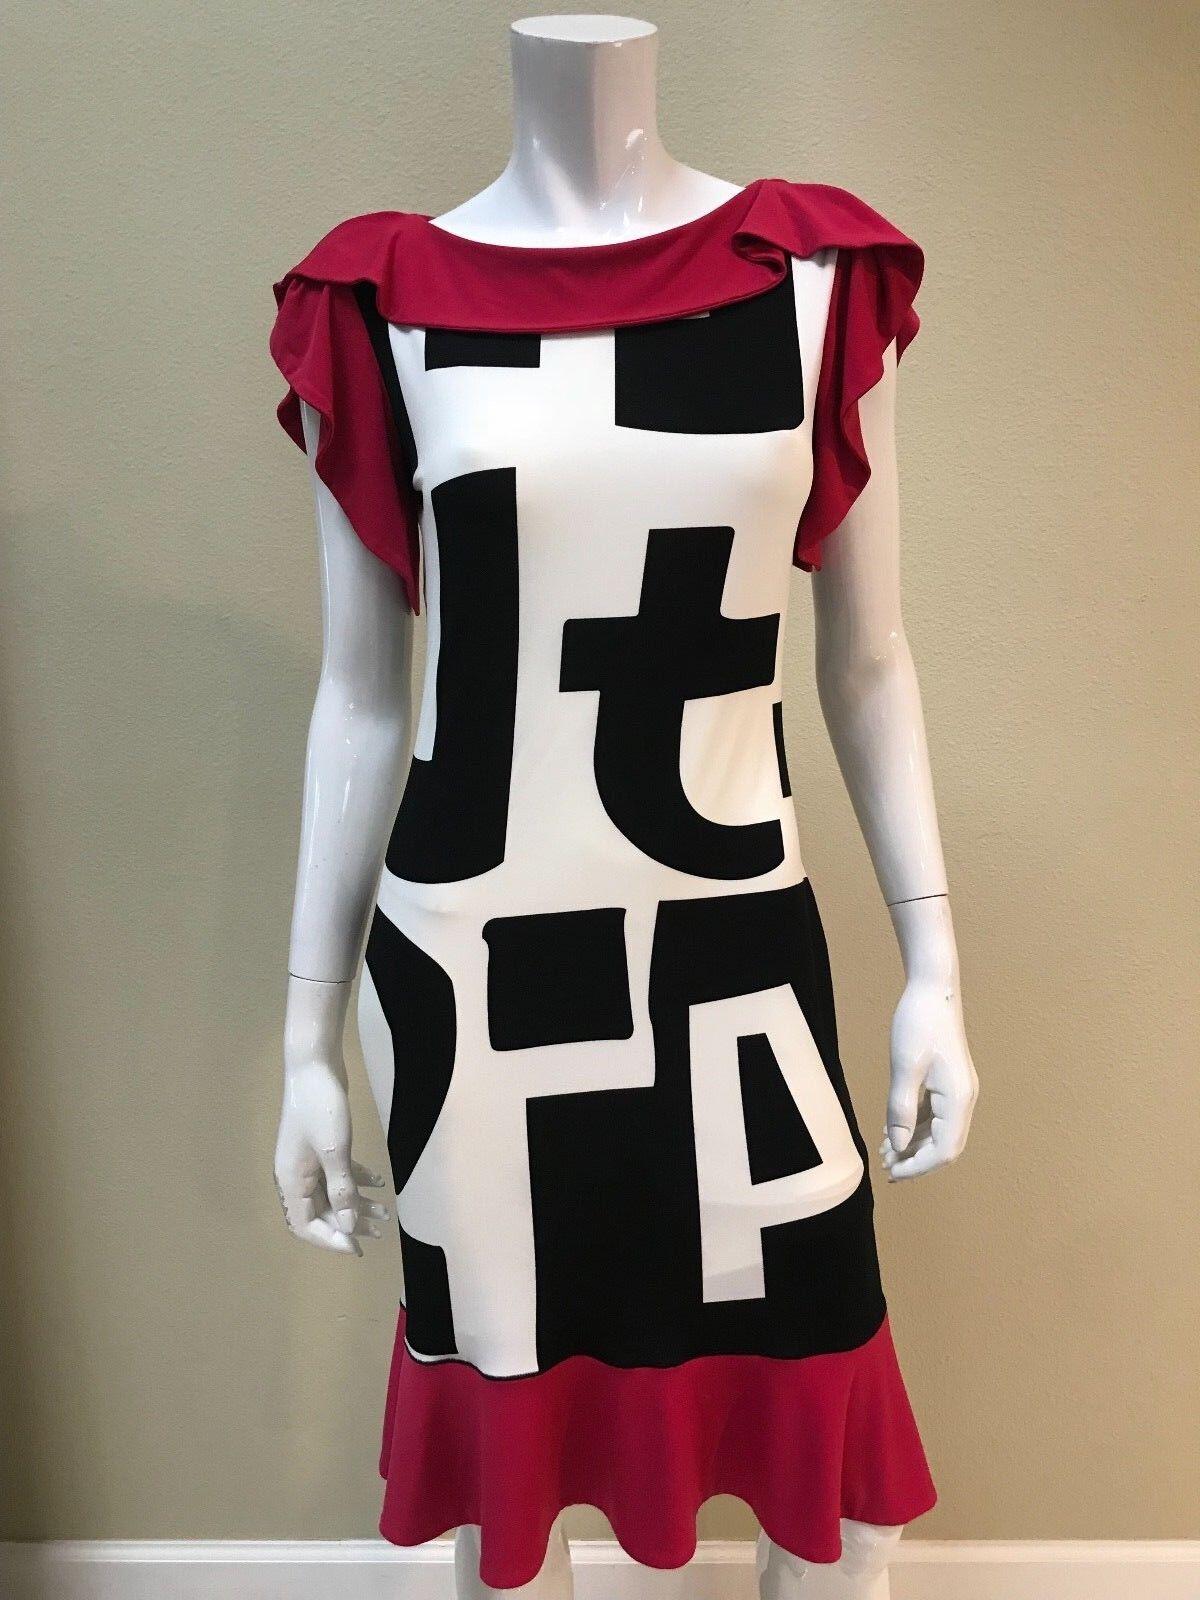 EVA VARRO NWT Multicolor Letter Print Flounce Trim Flare Dress Size Small NEW